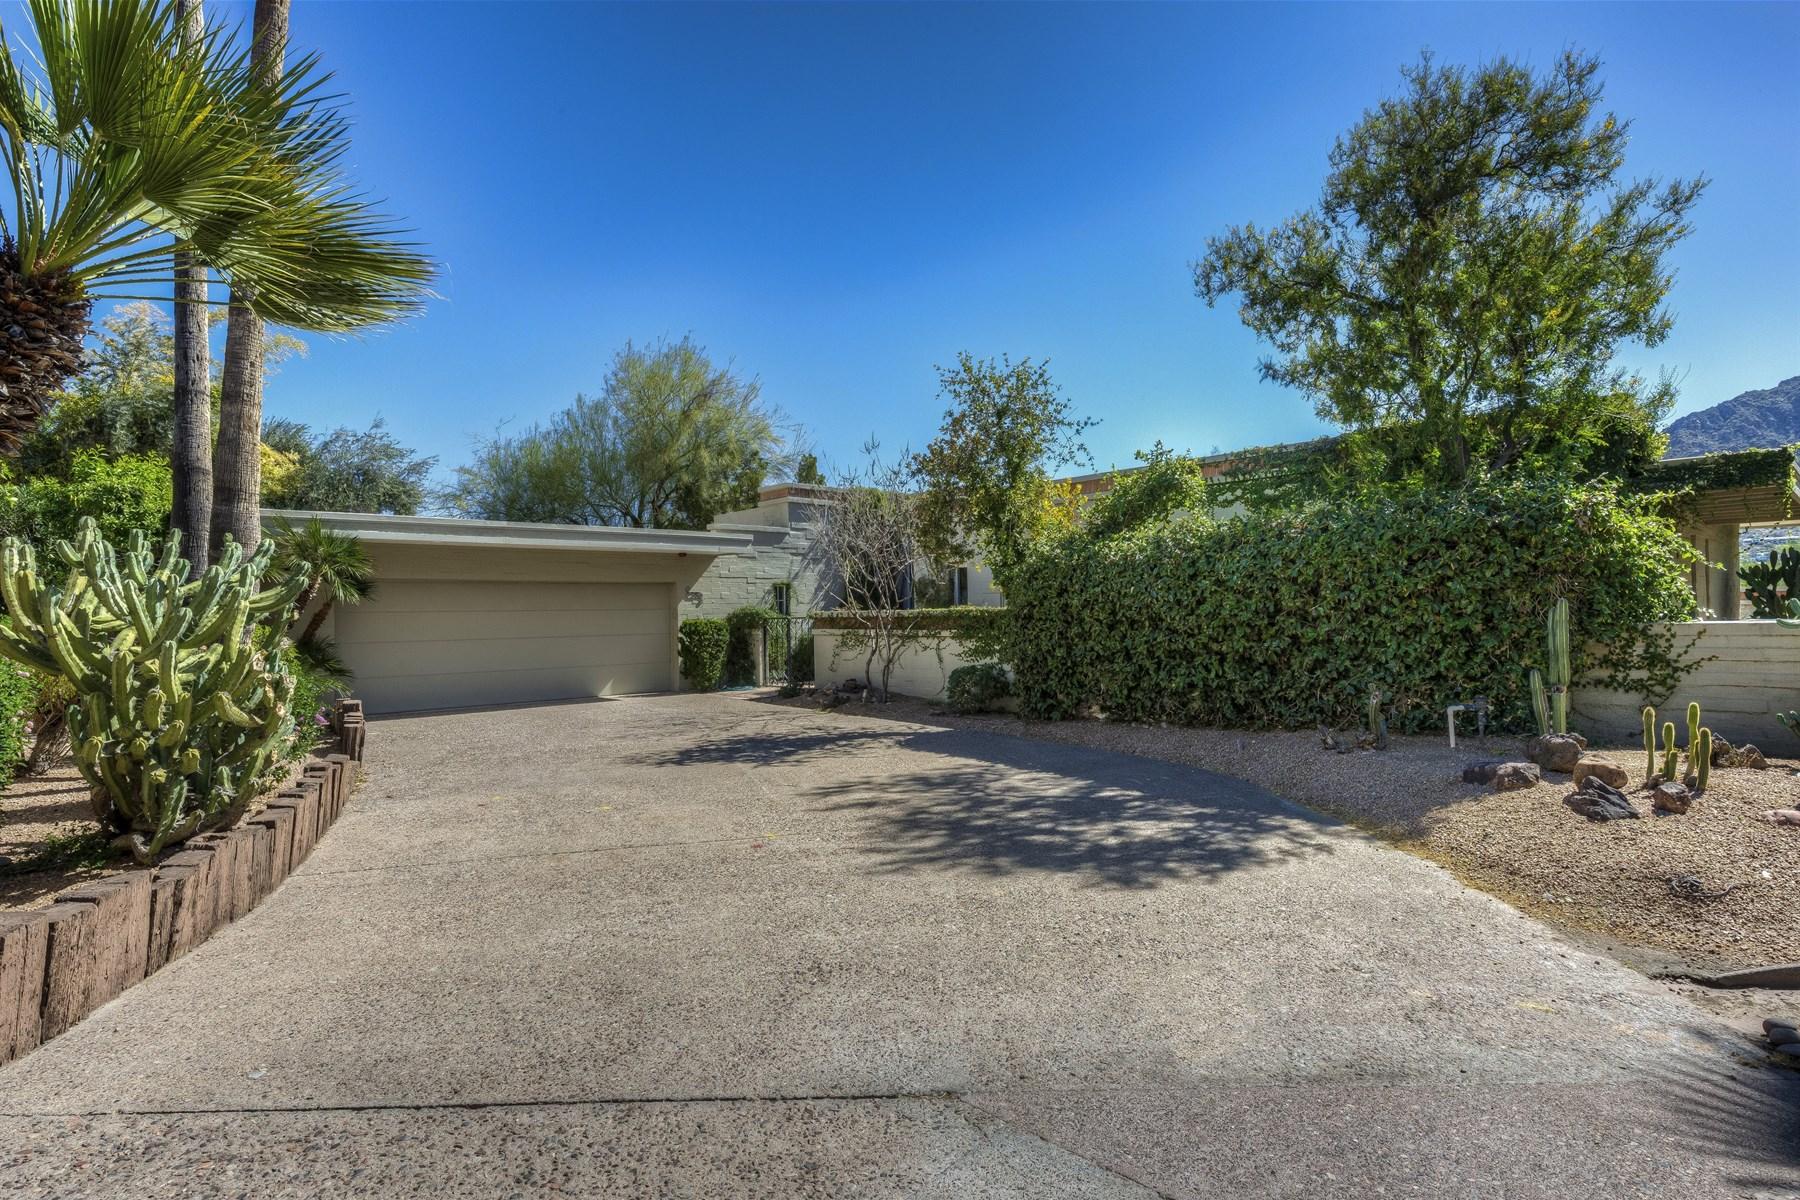 Частный односемейный дом для того Продажа на Soft Contemporary has been highly upgraded and expanded 5434 E Lincoln Dr #39 Paradise Valley, Аризона, 85253 Соединенные Штаты